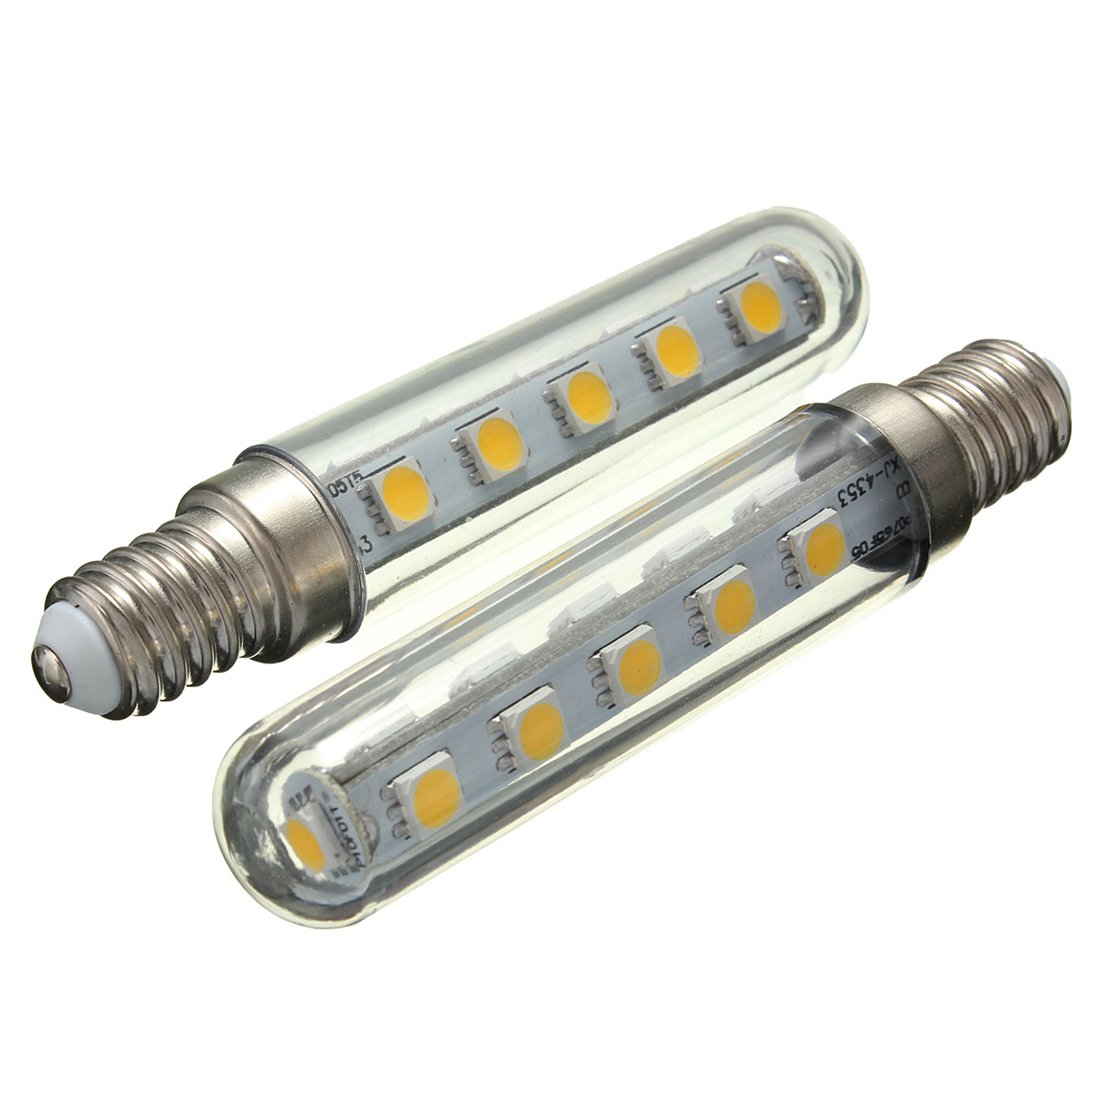 2pcs 2.5W Led Light Bulb For Kitchen Chimney Hood Exhaust